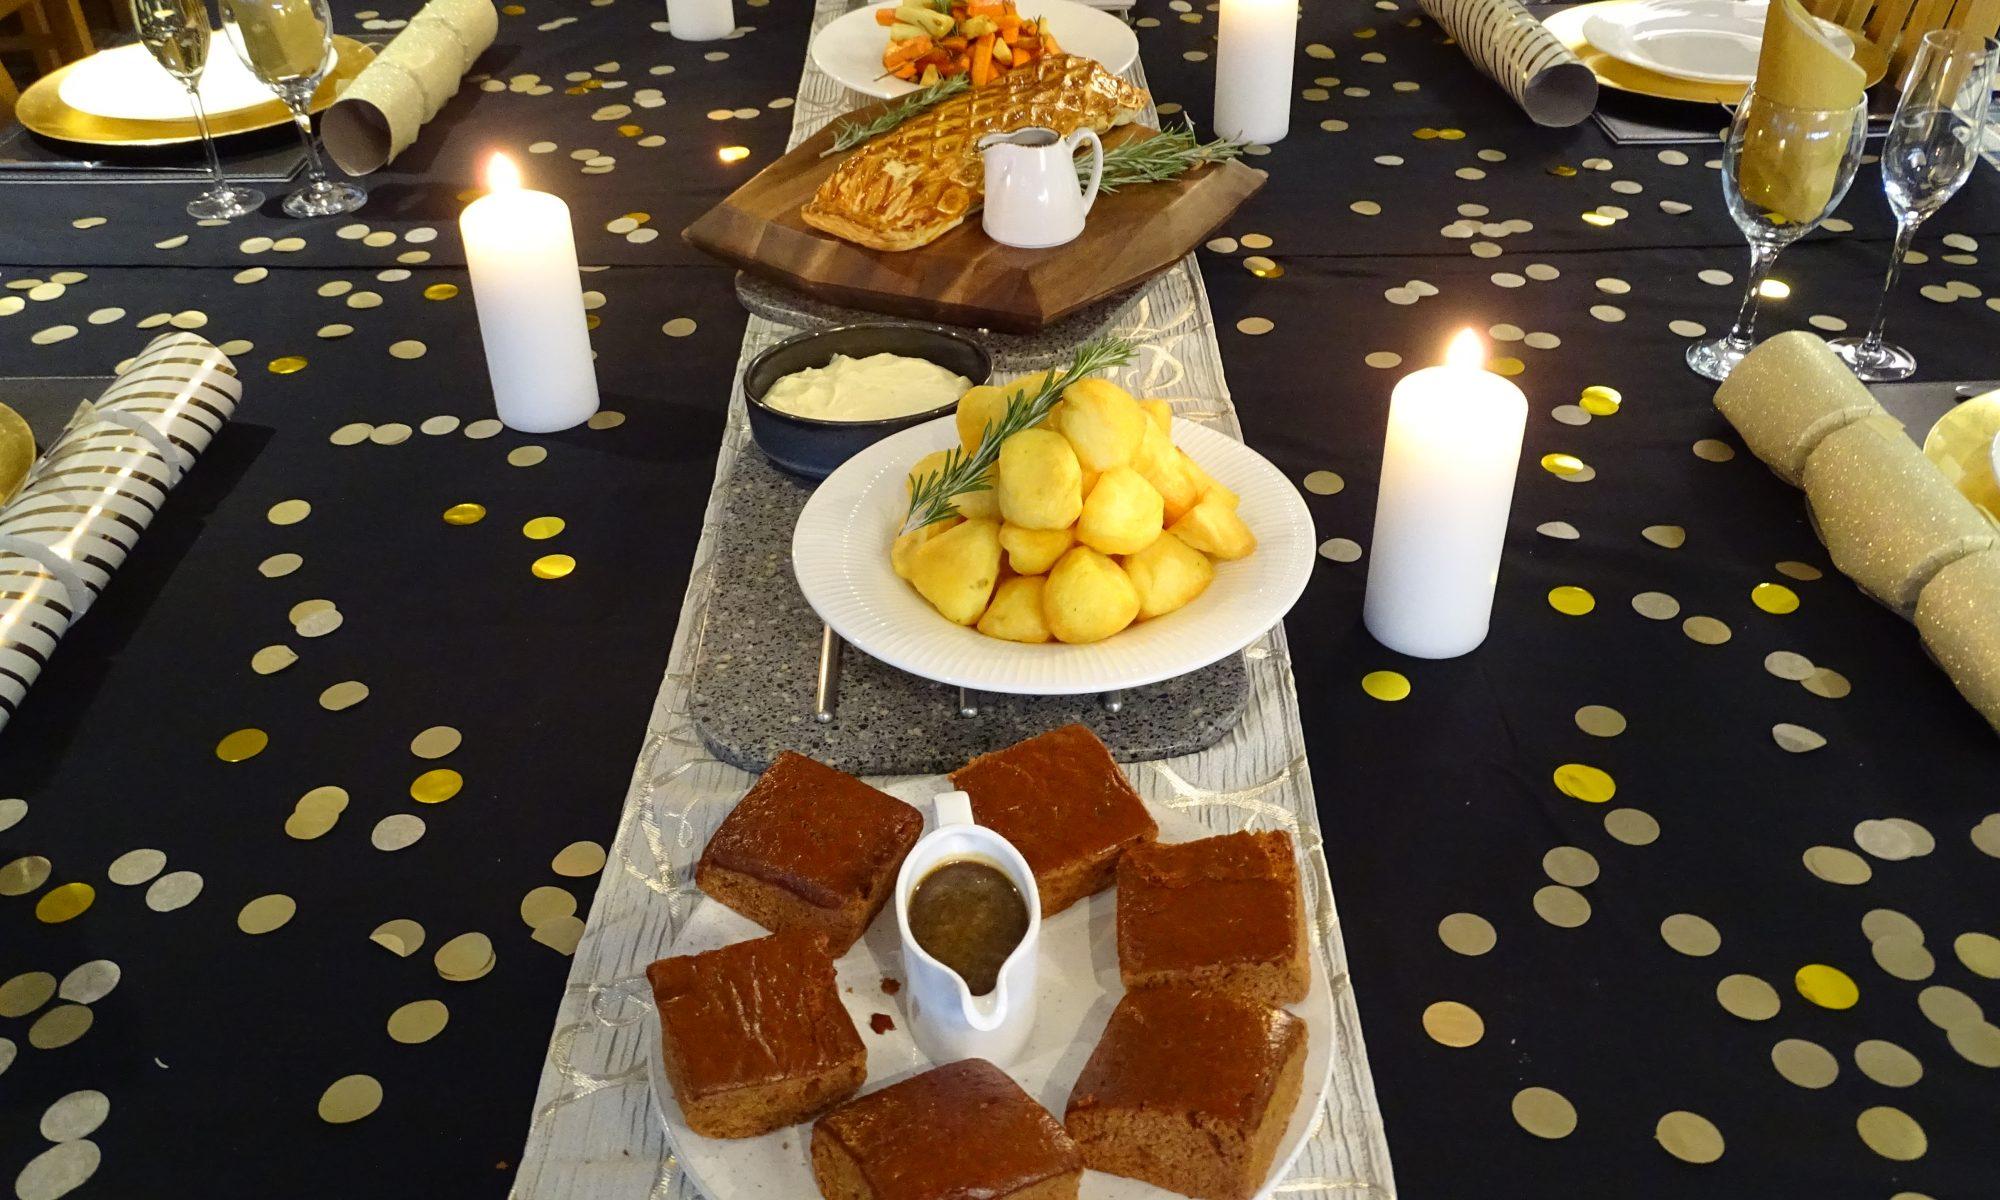 NEW YEAR'S DINNER SPREAD